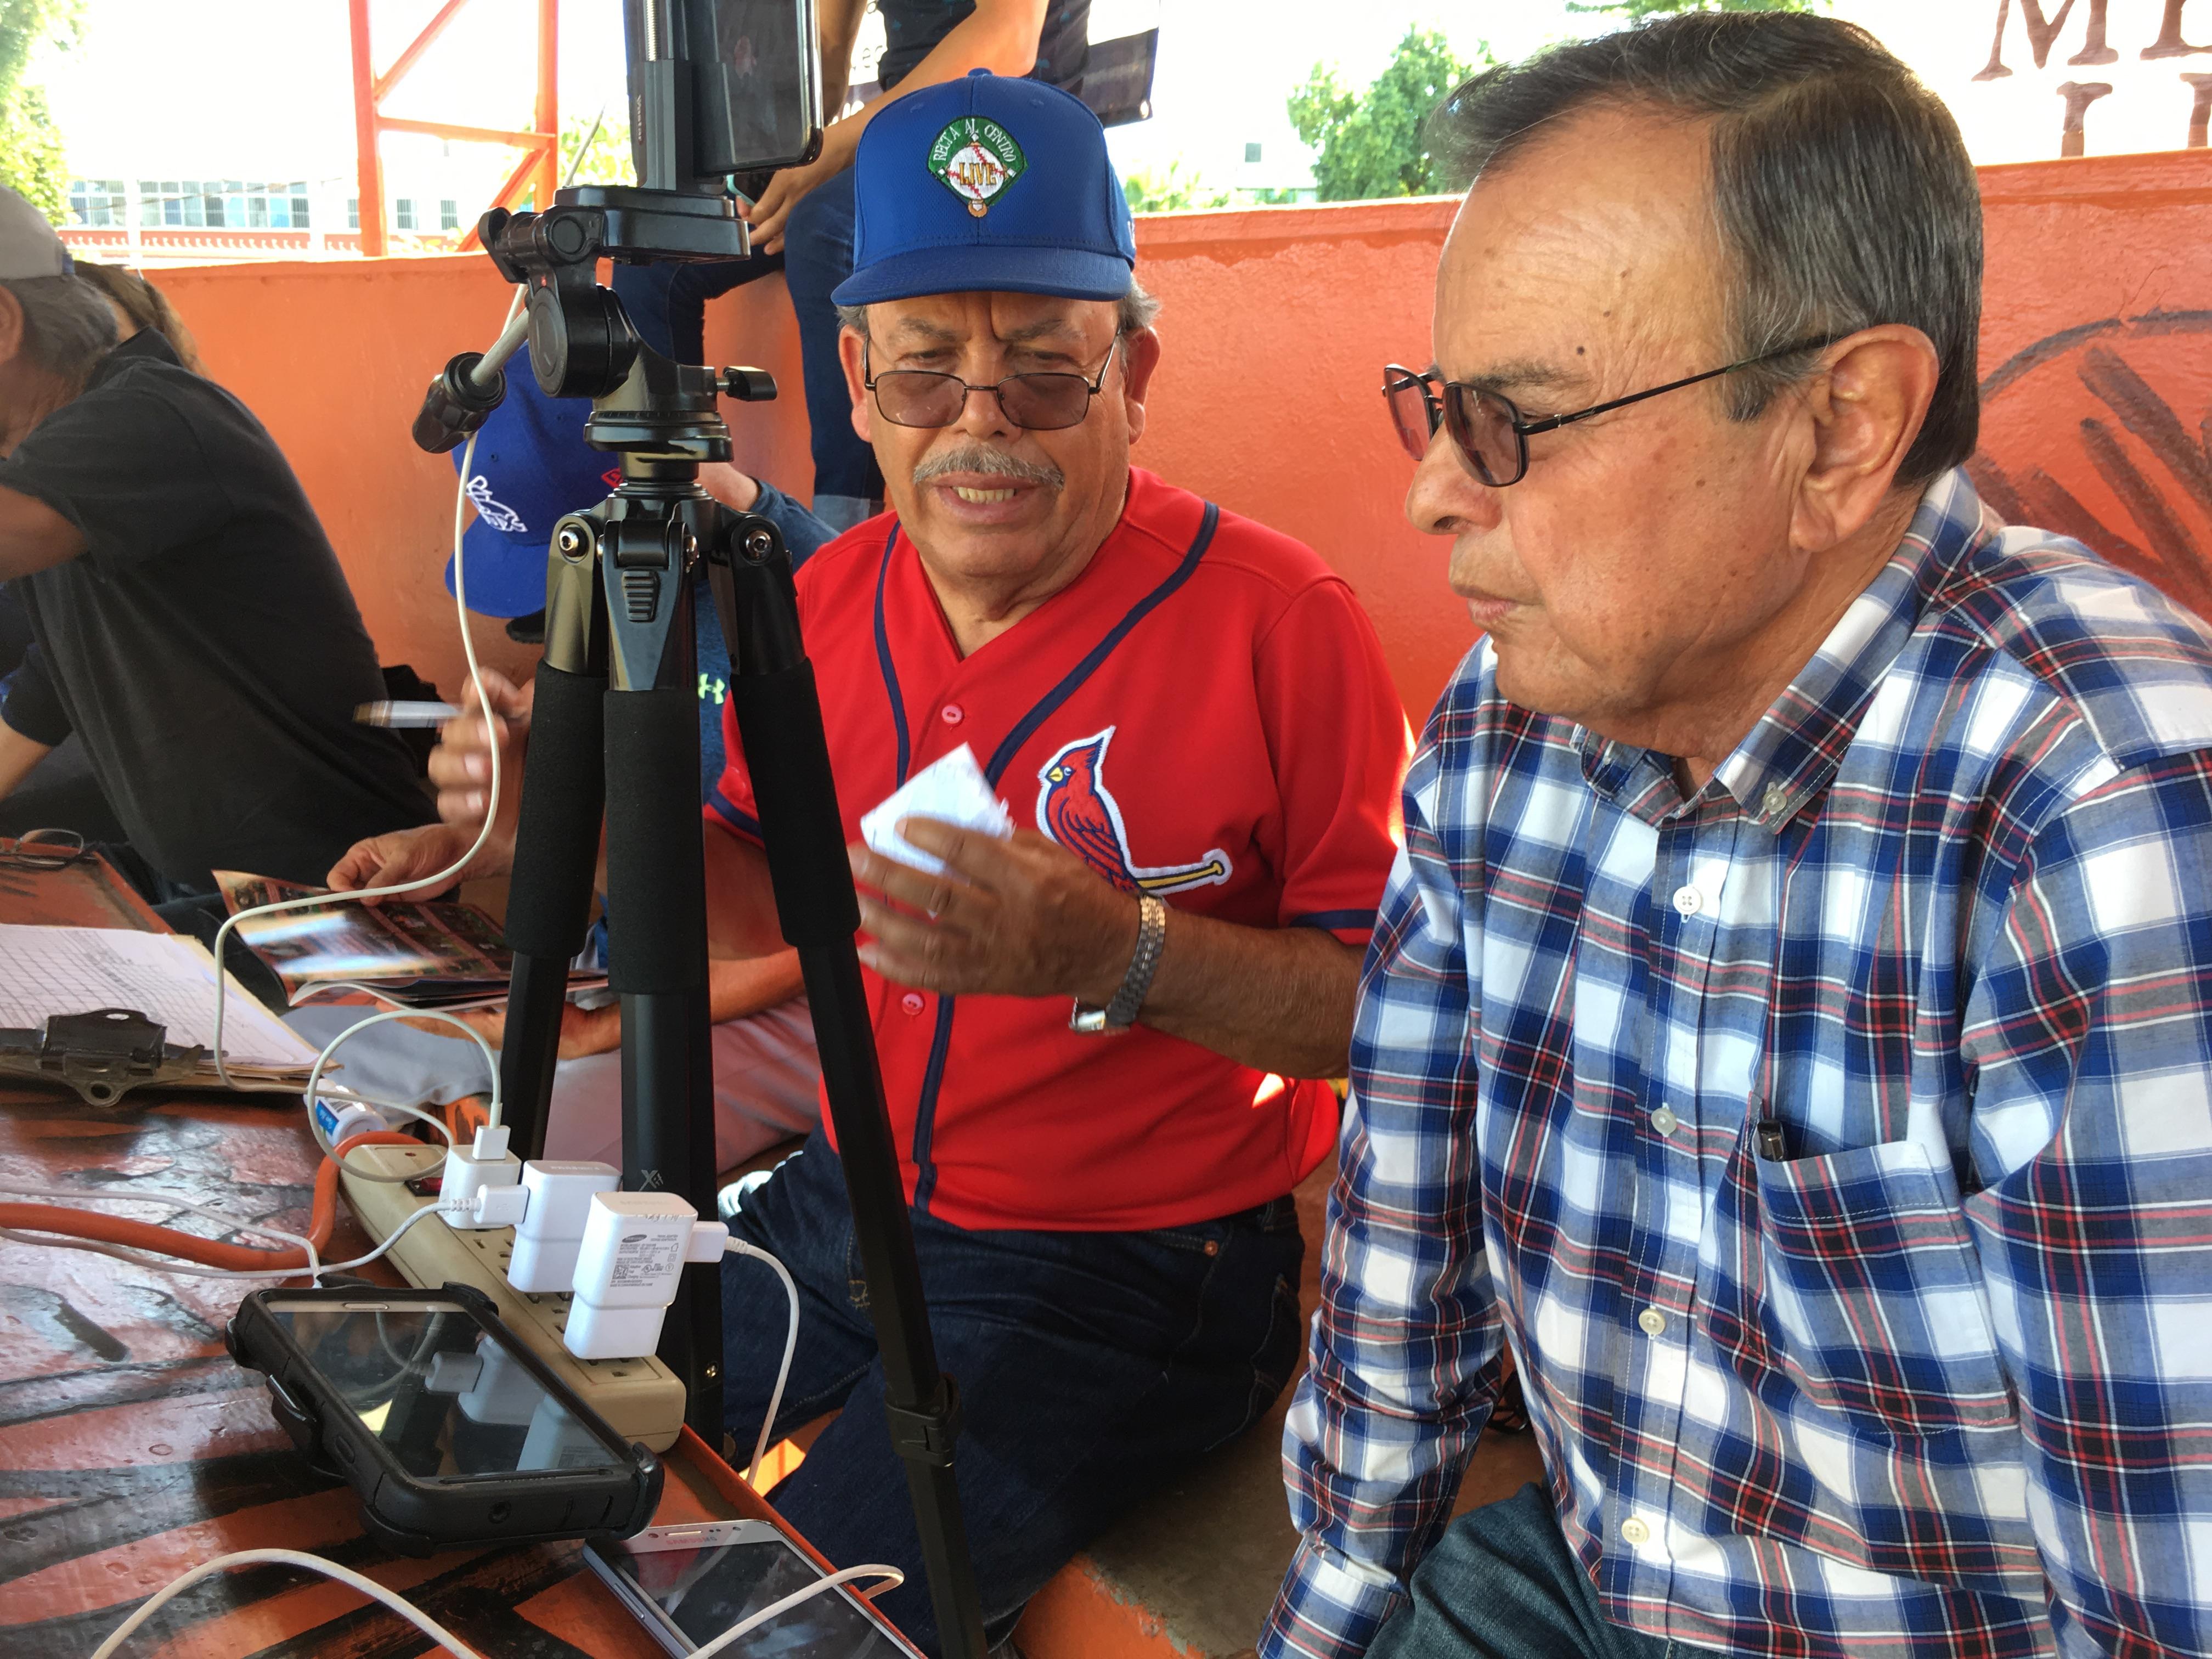 Celebra Recta al Centro Live Primer Aniversario en Nacional de Beisbol